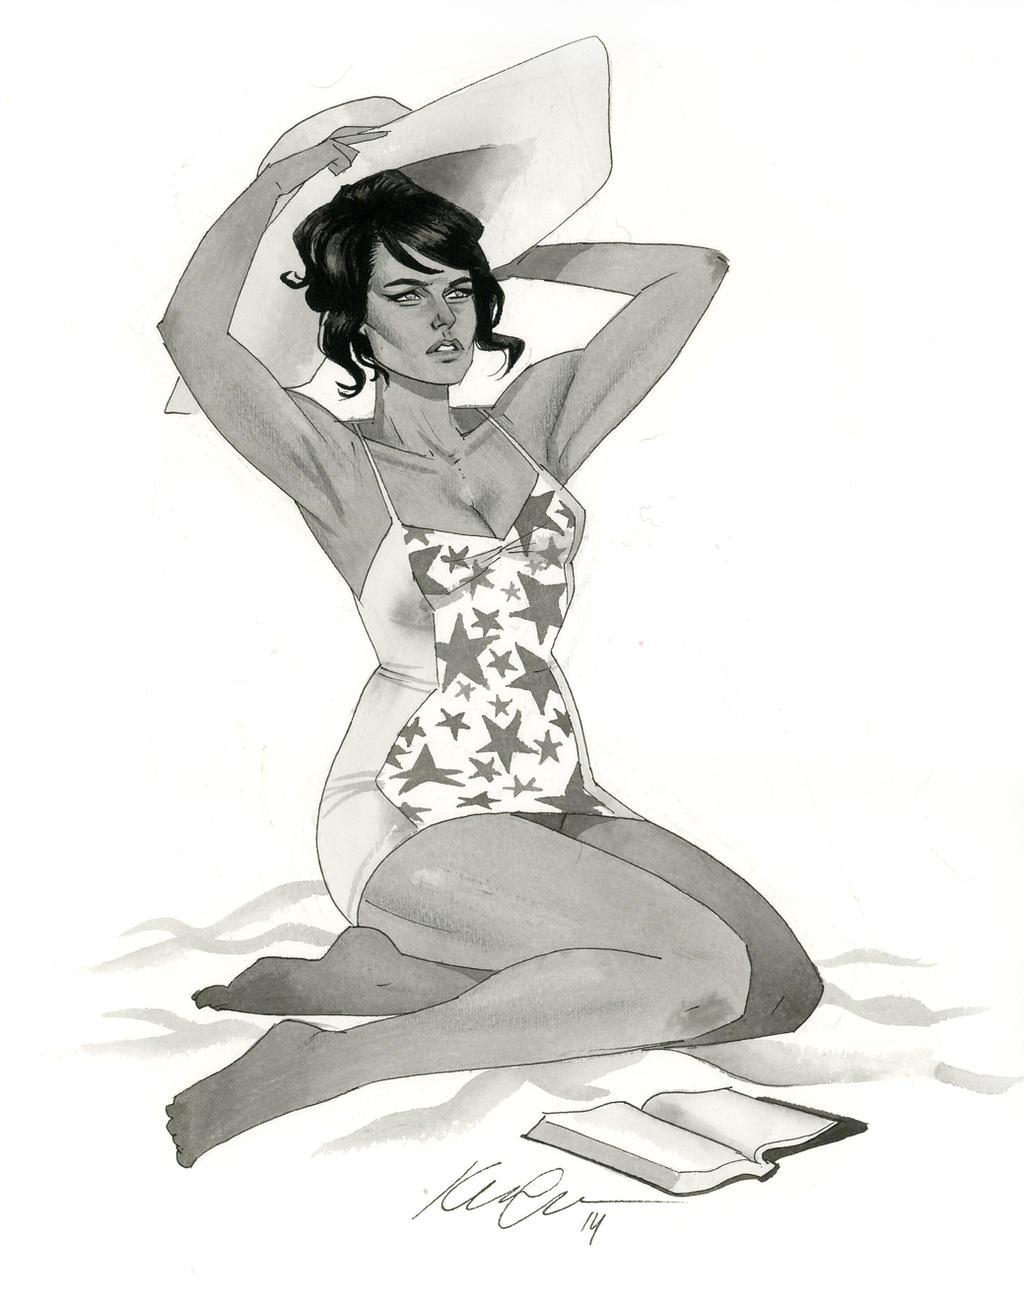 60s Wonder Woman - HeroesCon 2014 sketch by kevinwada